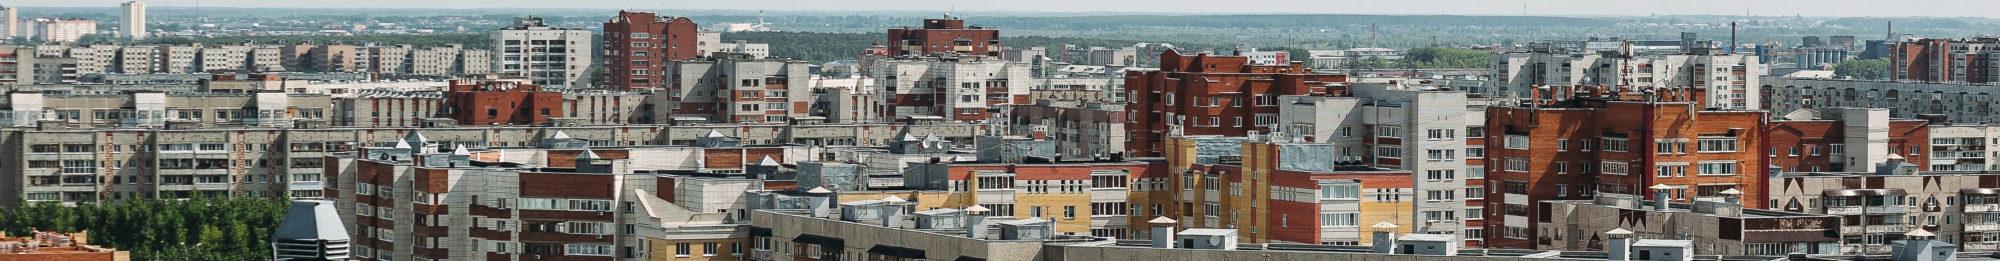 "КОГБУ ""БТИ"" Кадастровая оценка"